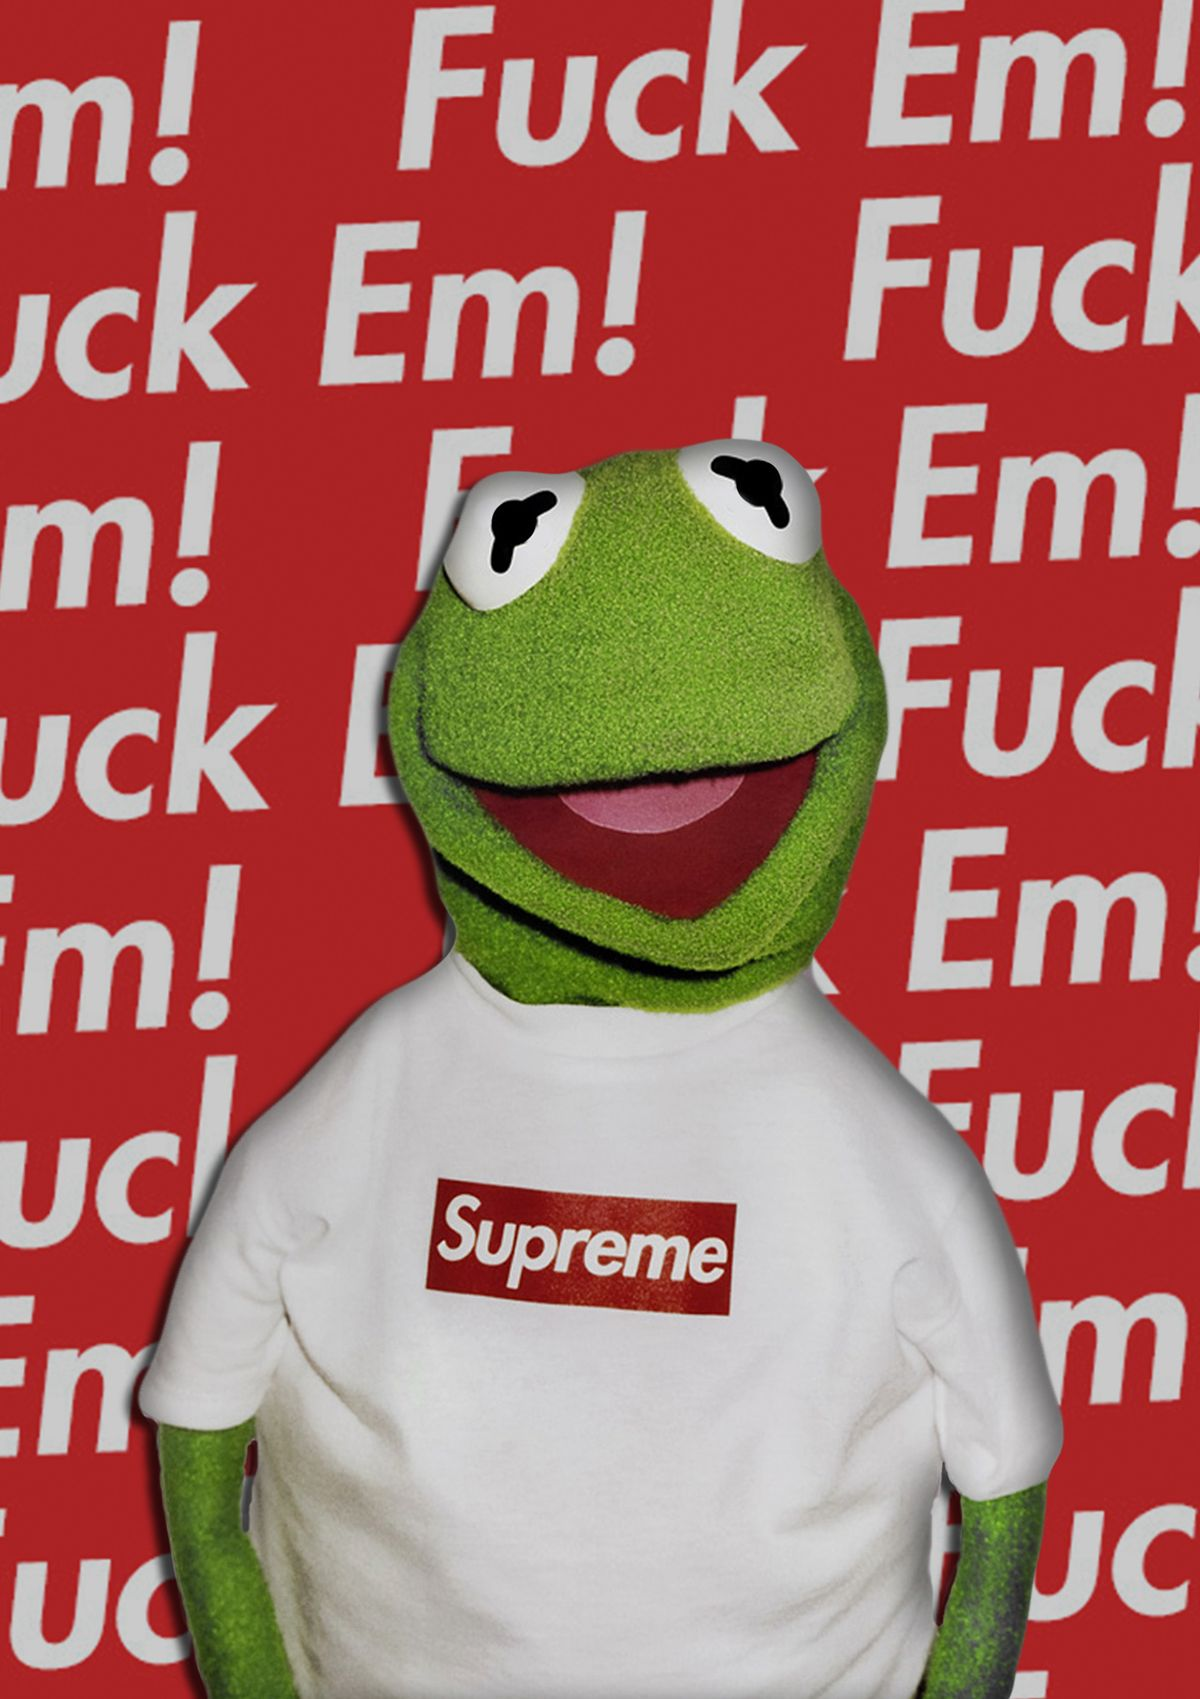 Supreme X Kermit Poster Design 2016